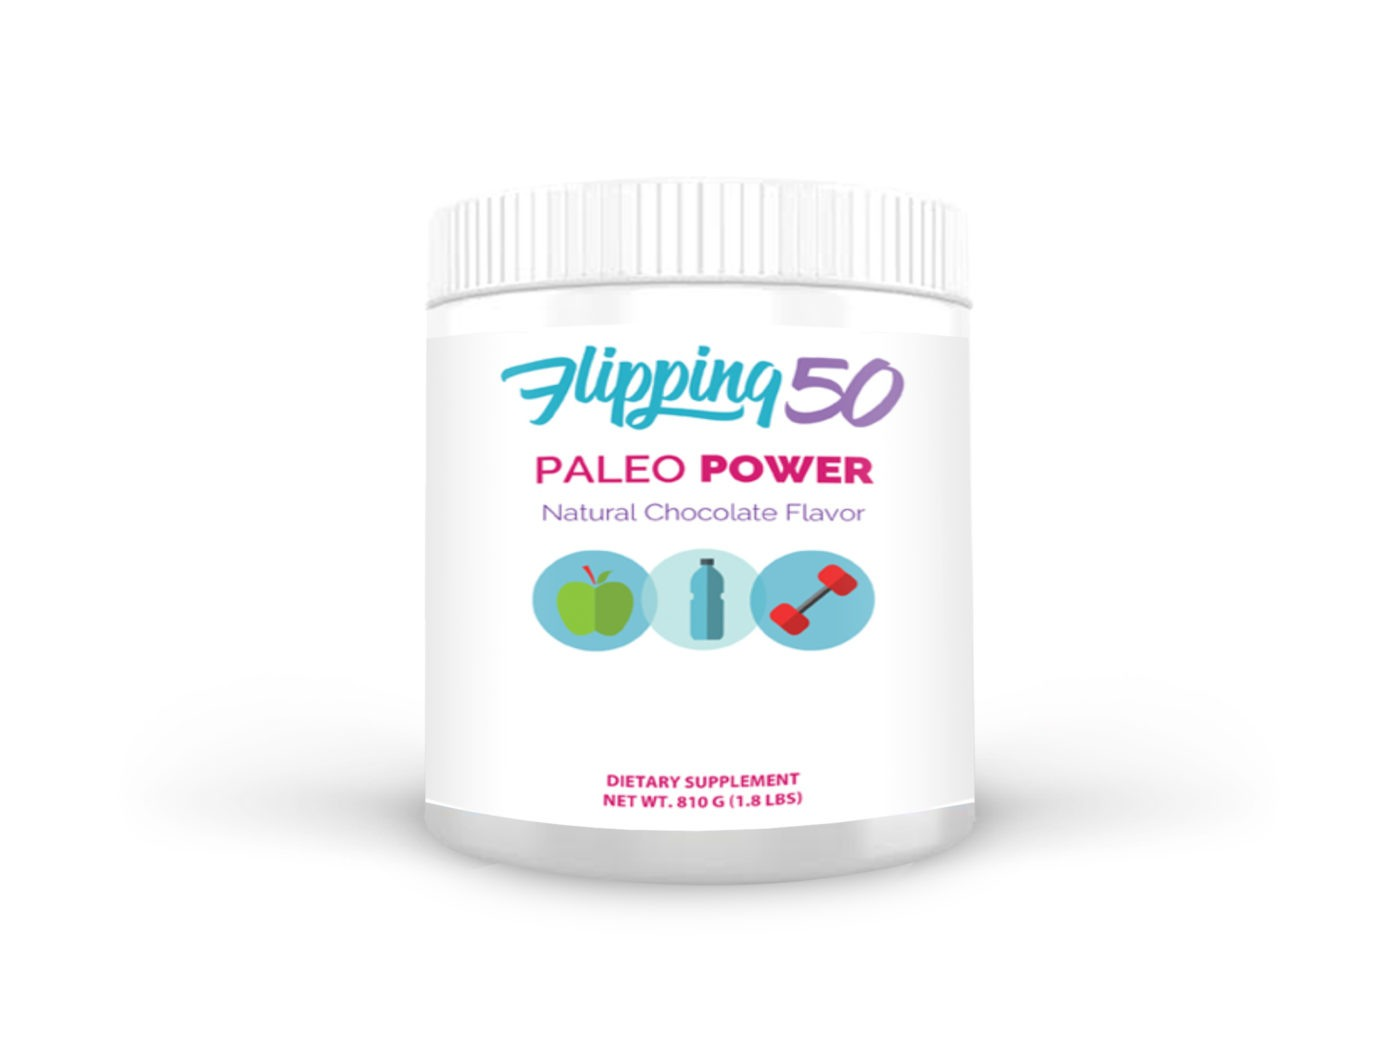 paleo-power-chocolate-protein-powder